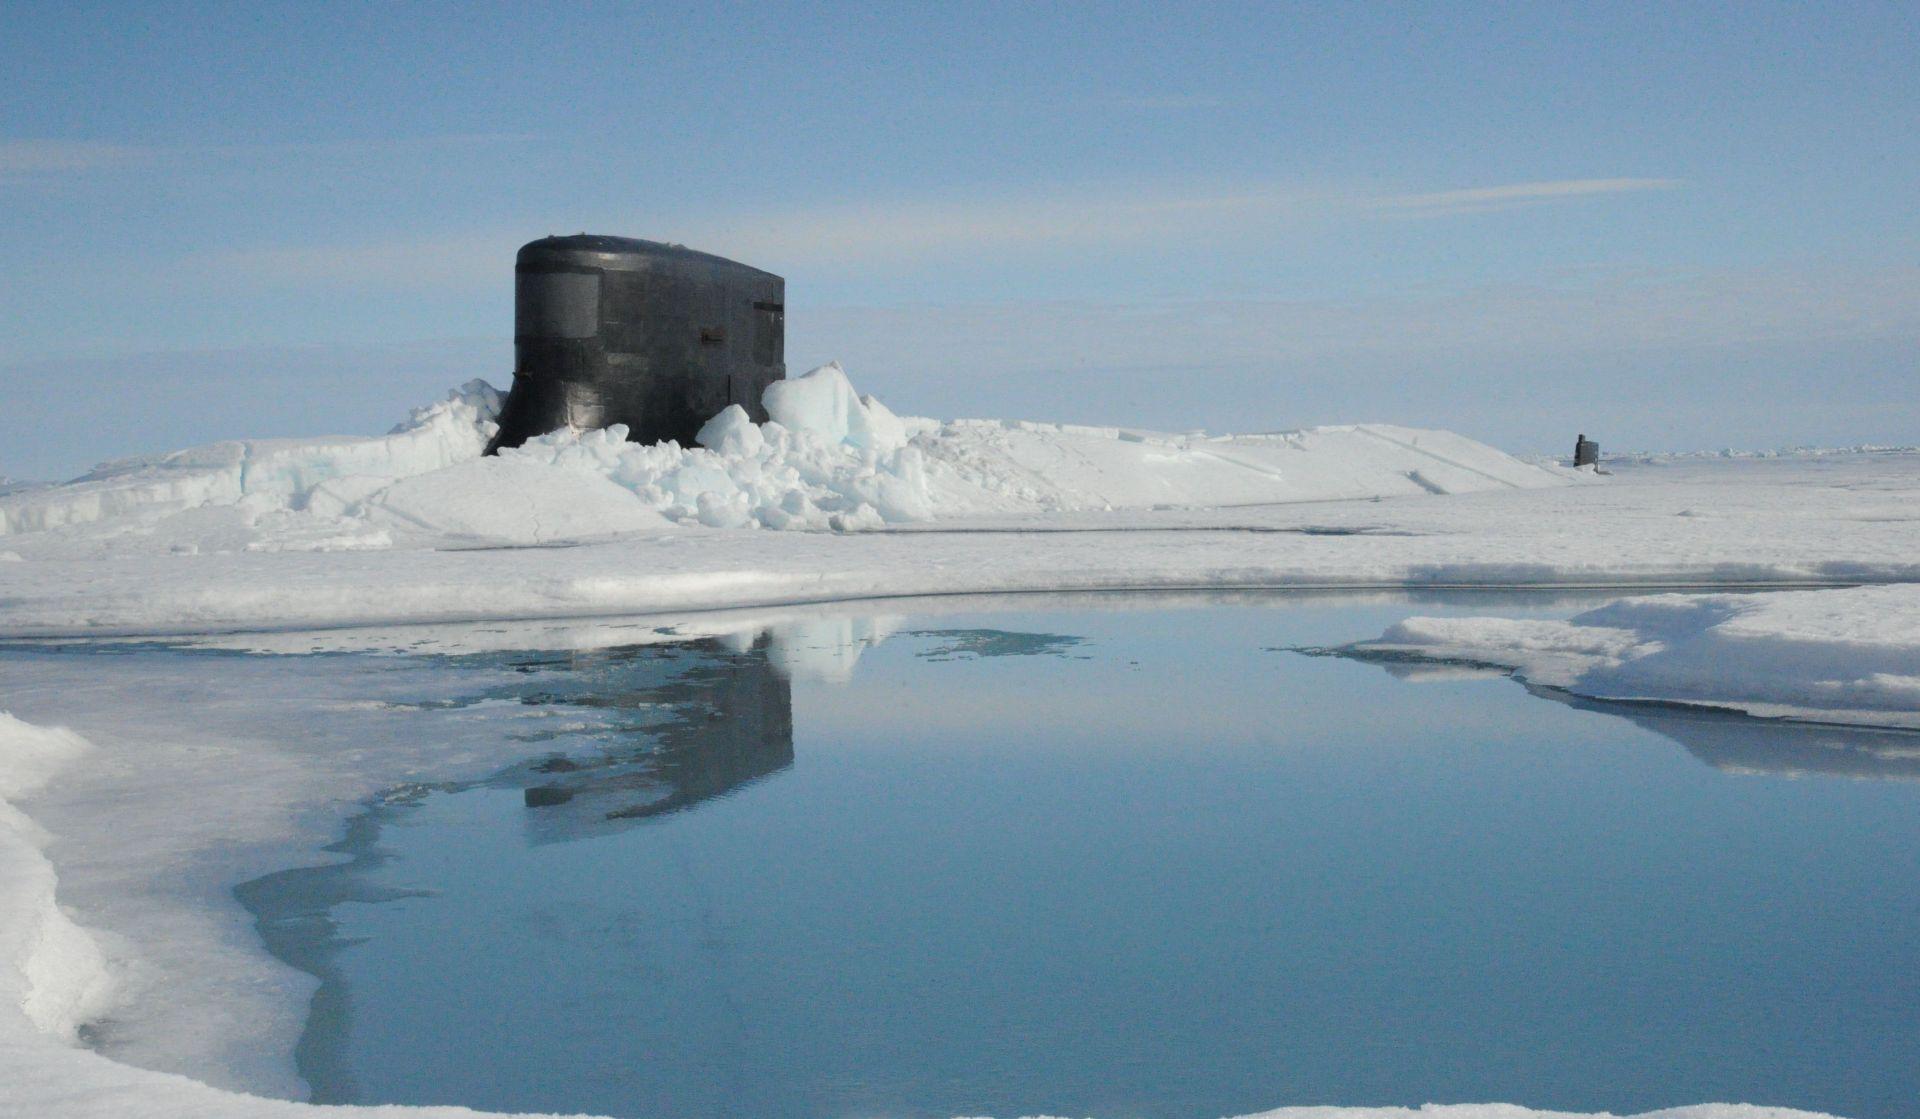 The fast attack submarine USS Seawolf (SSN 21)